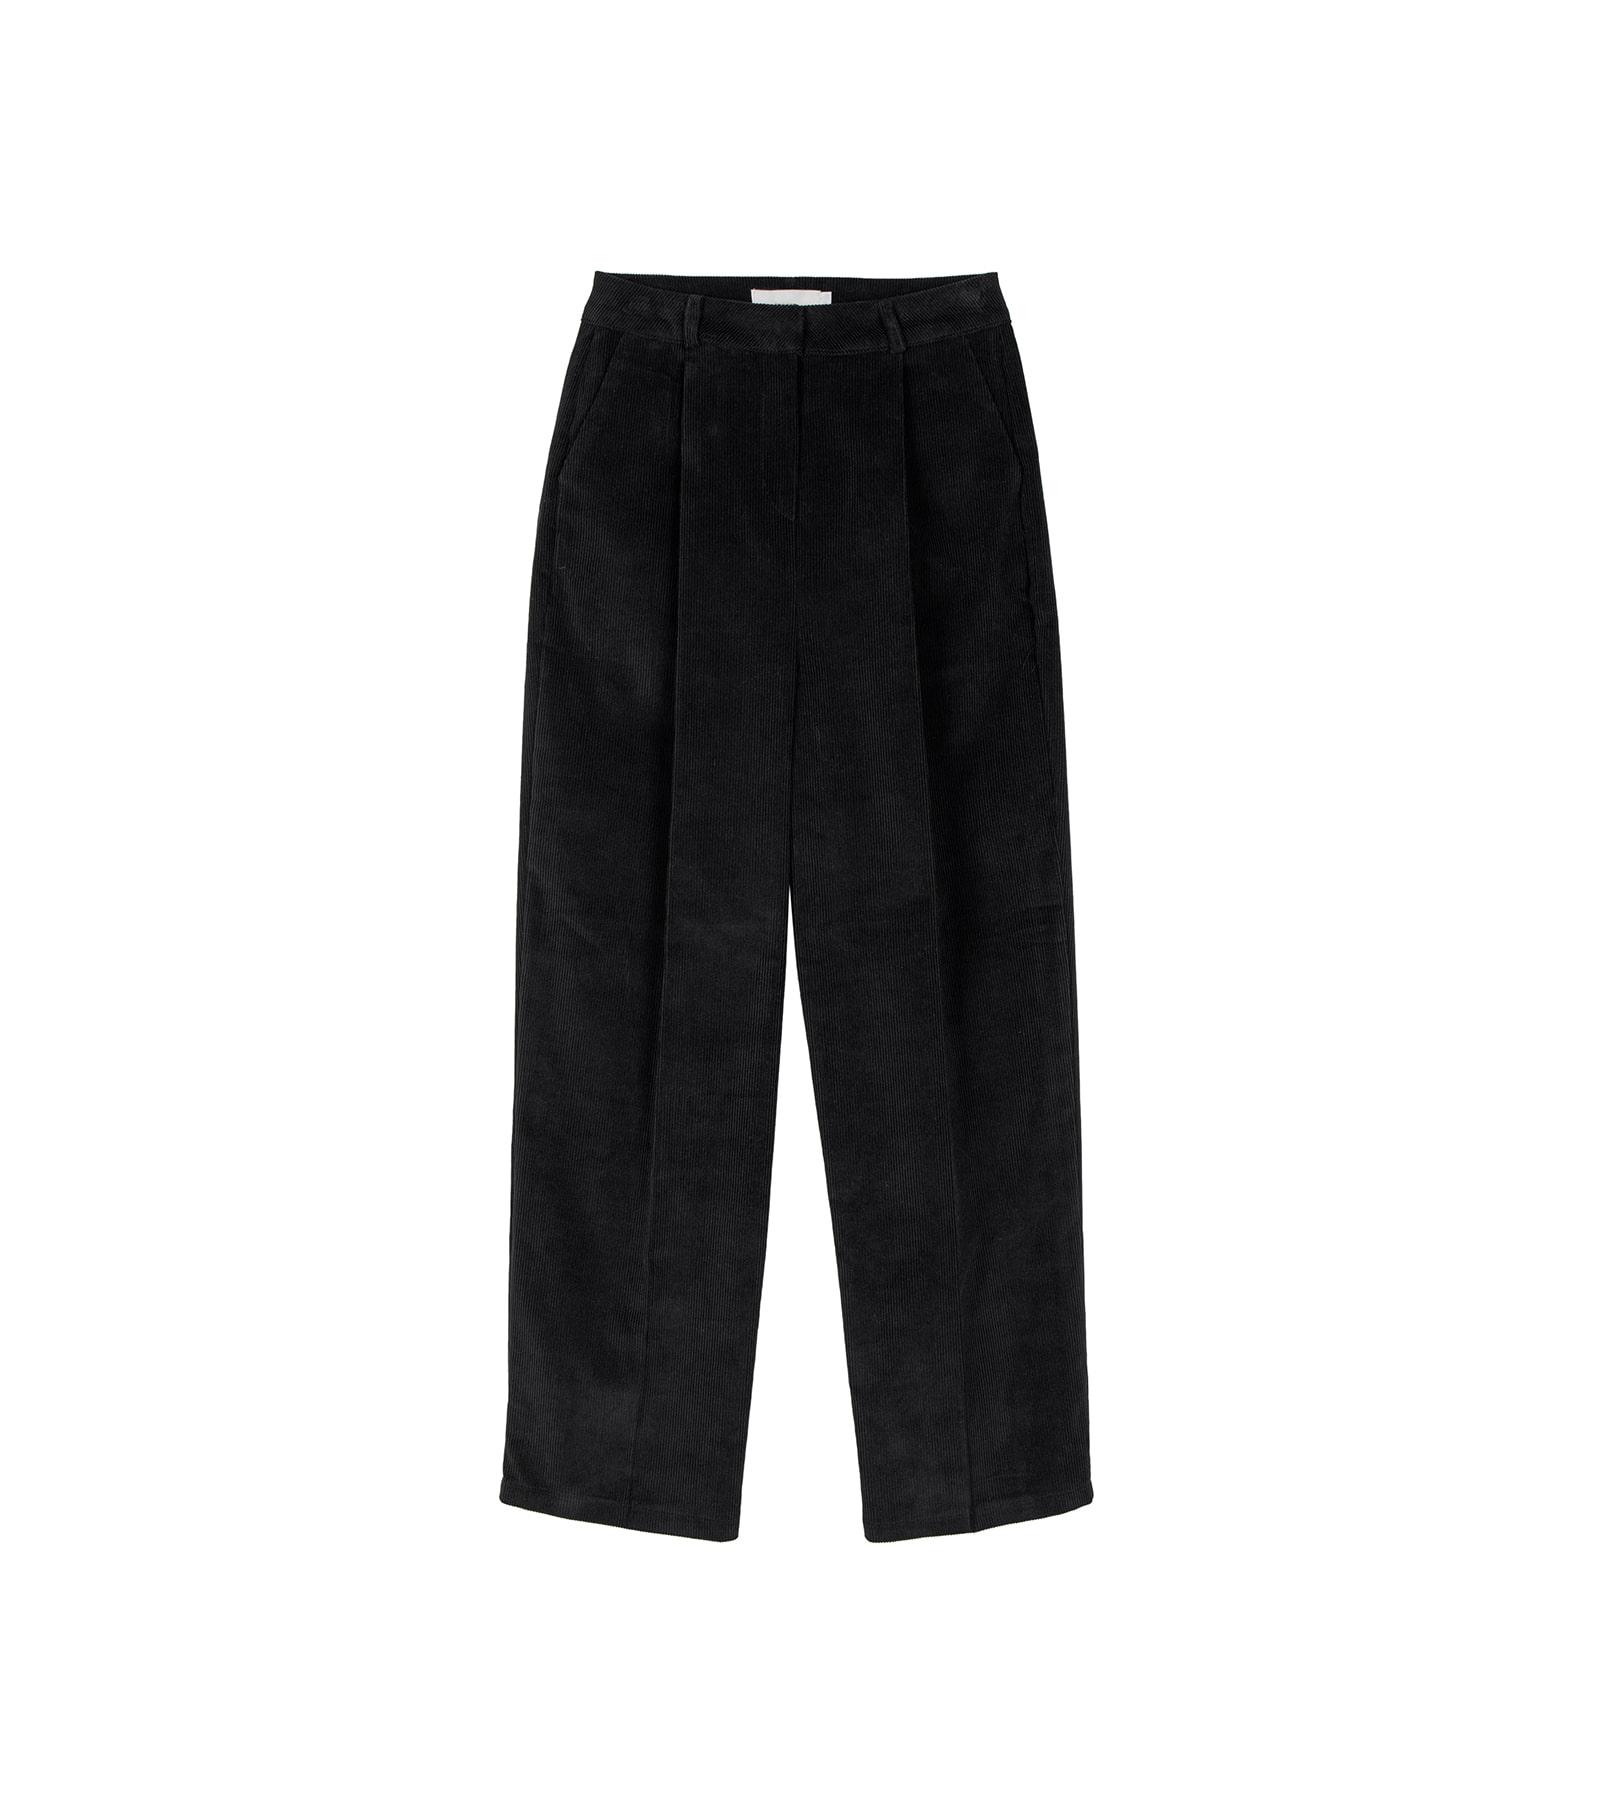 Jayden Golden straight trousers